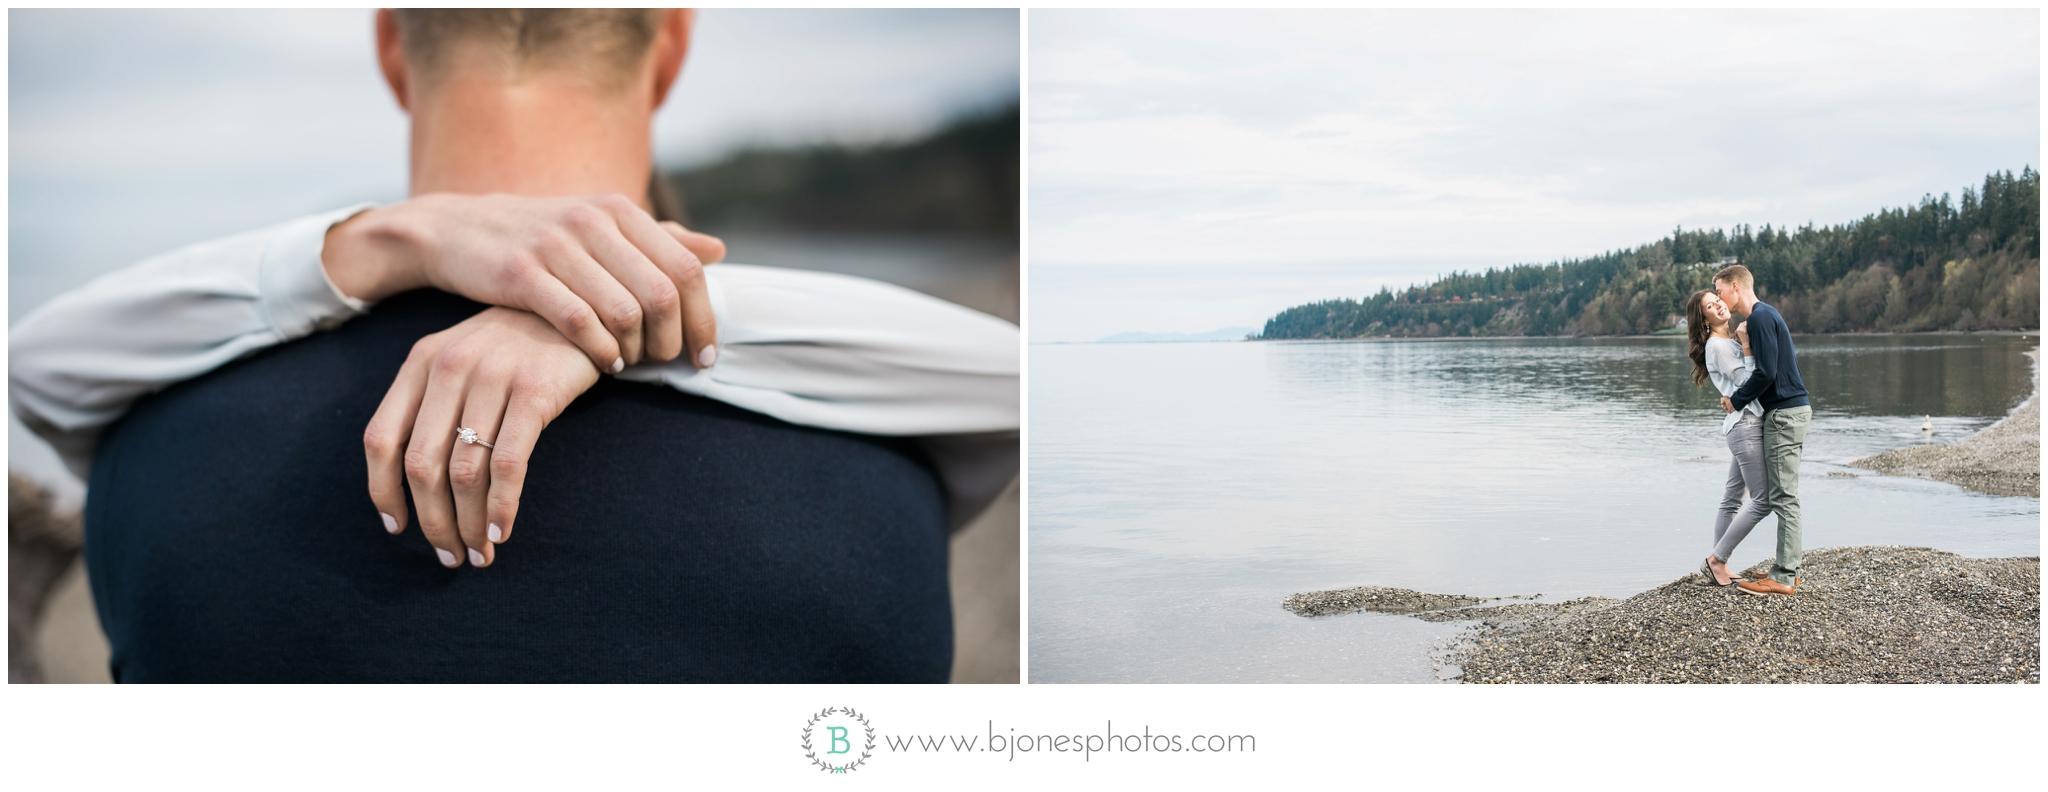 B. Jones Photography